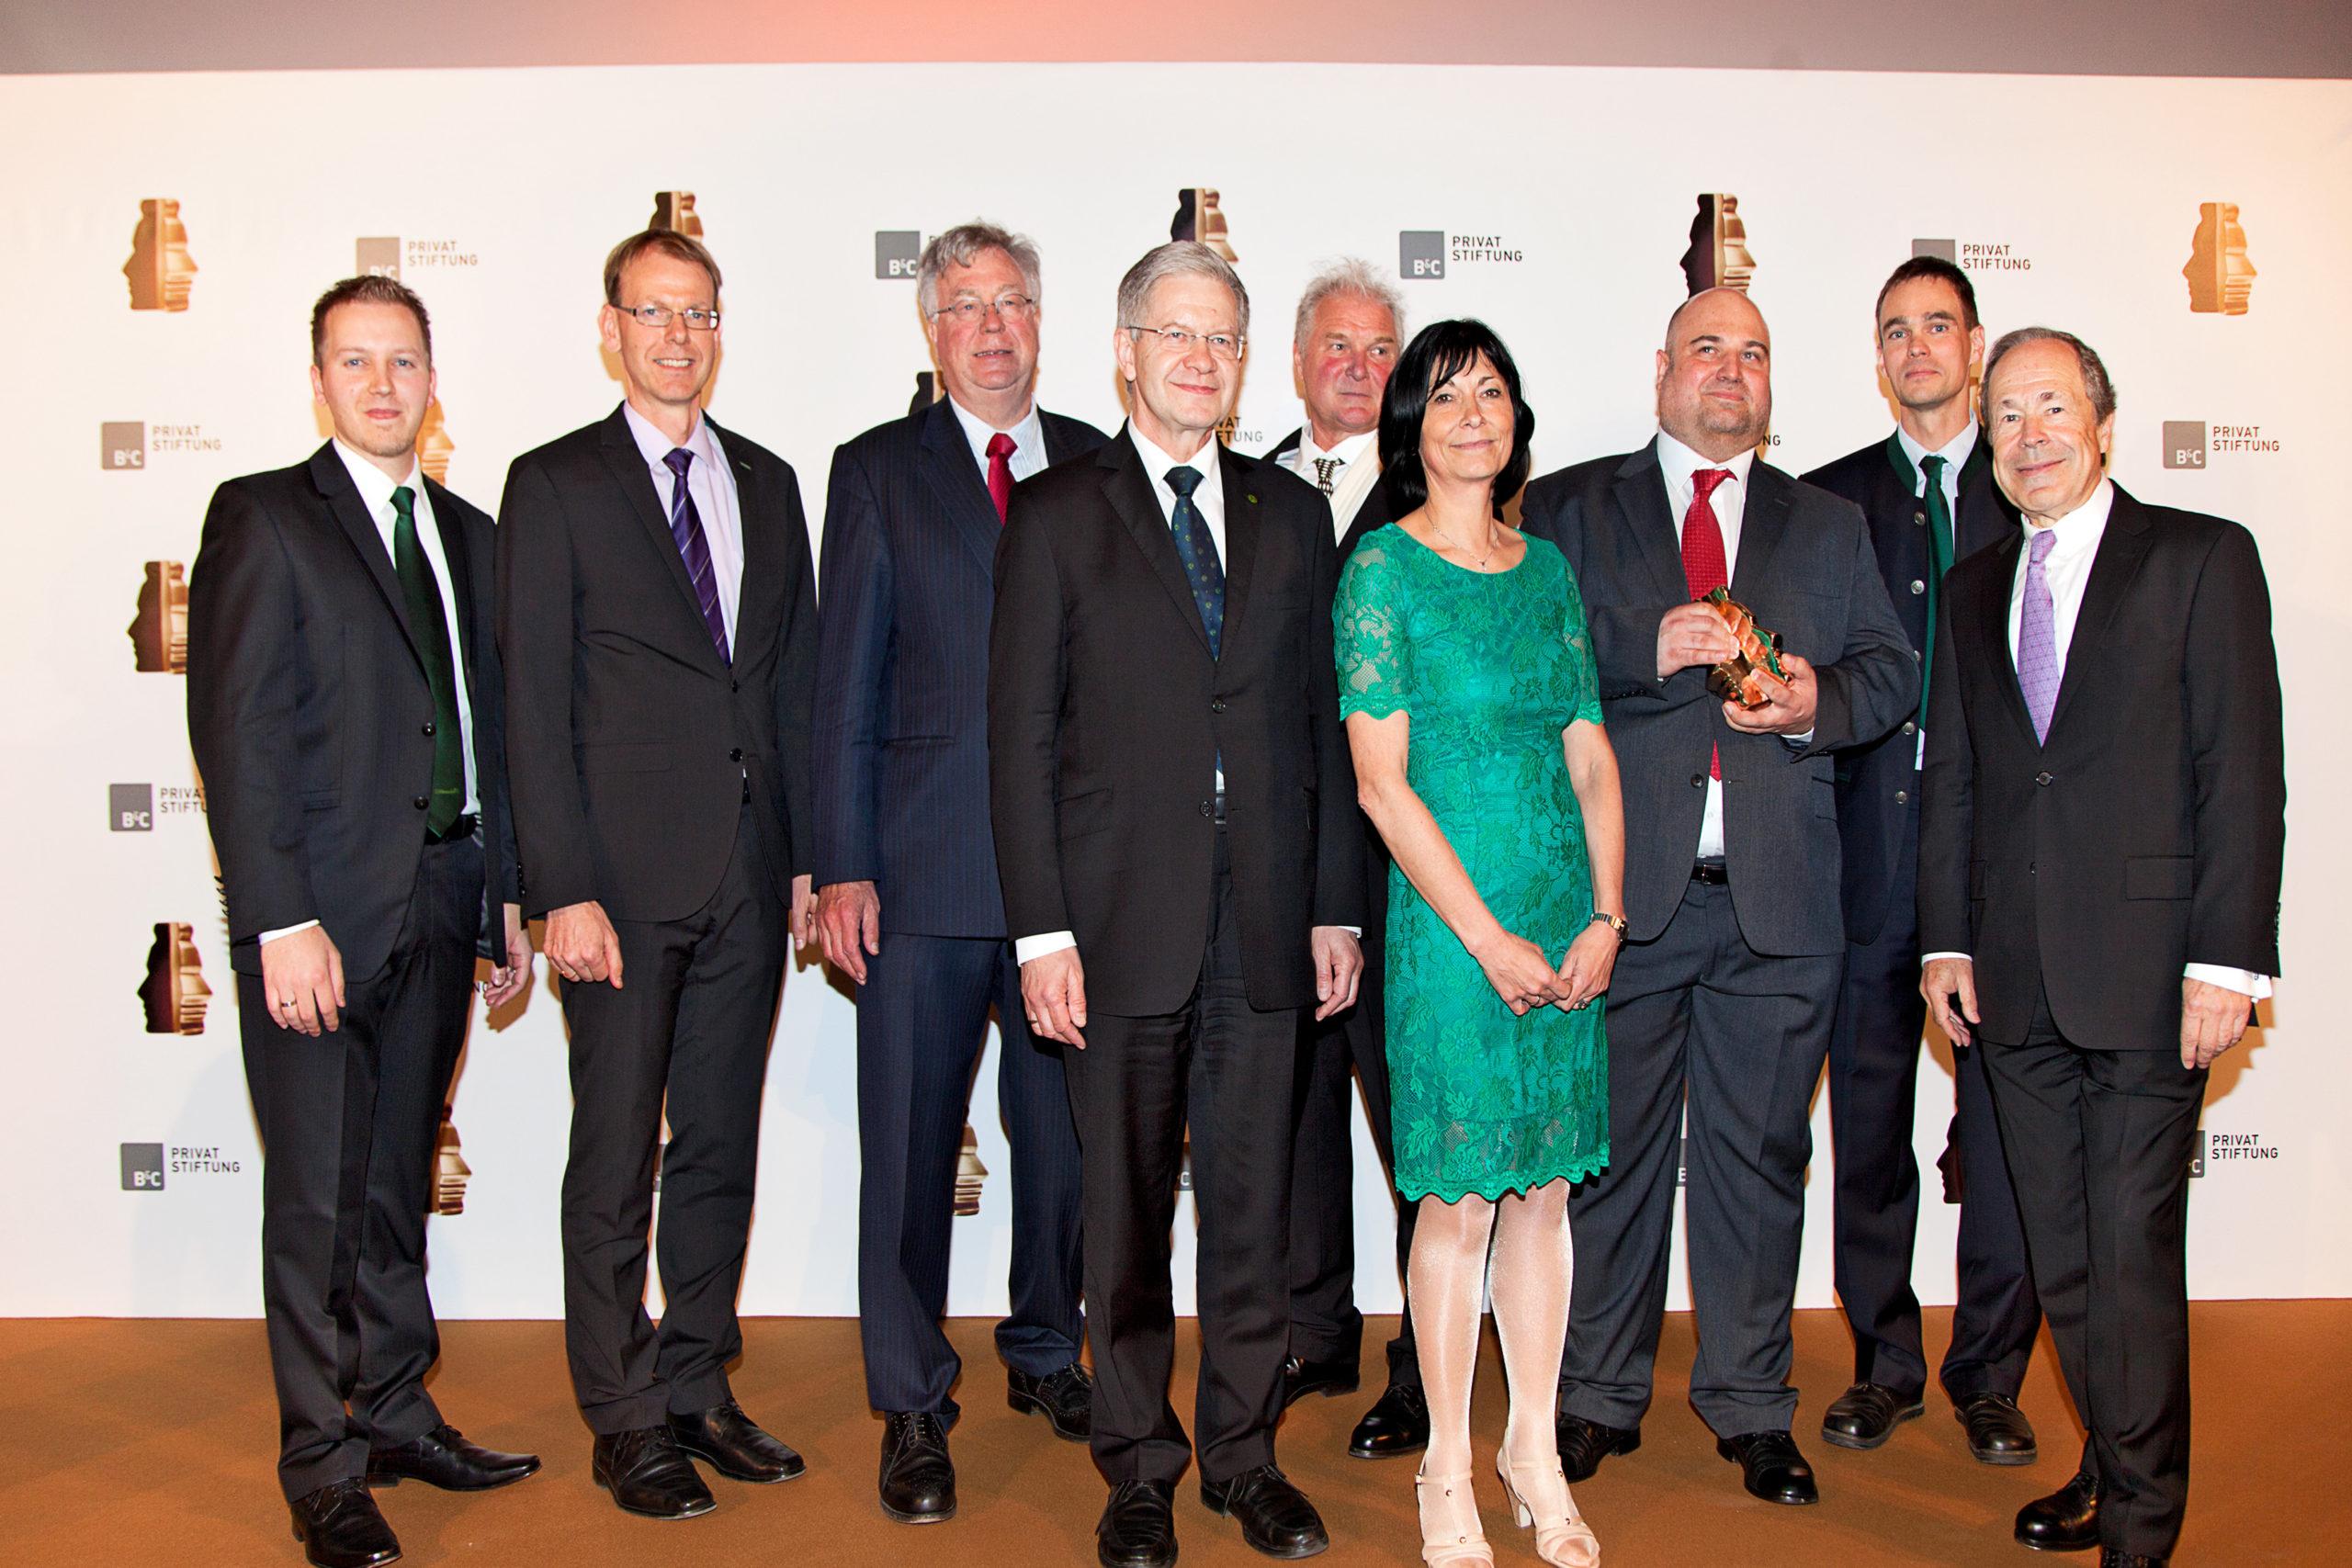 1. Platz Houskapreis 2014